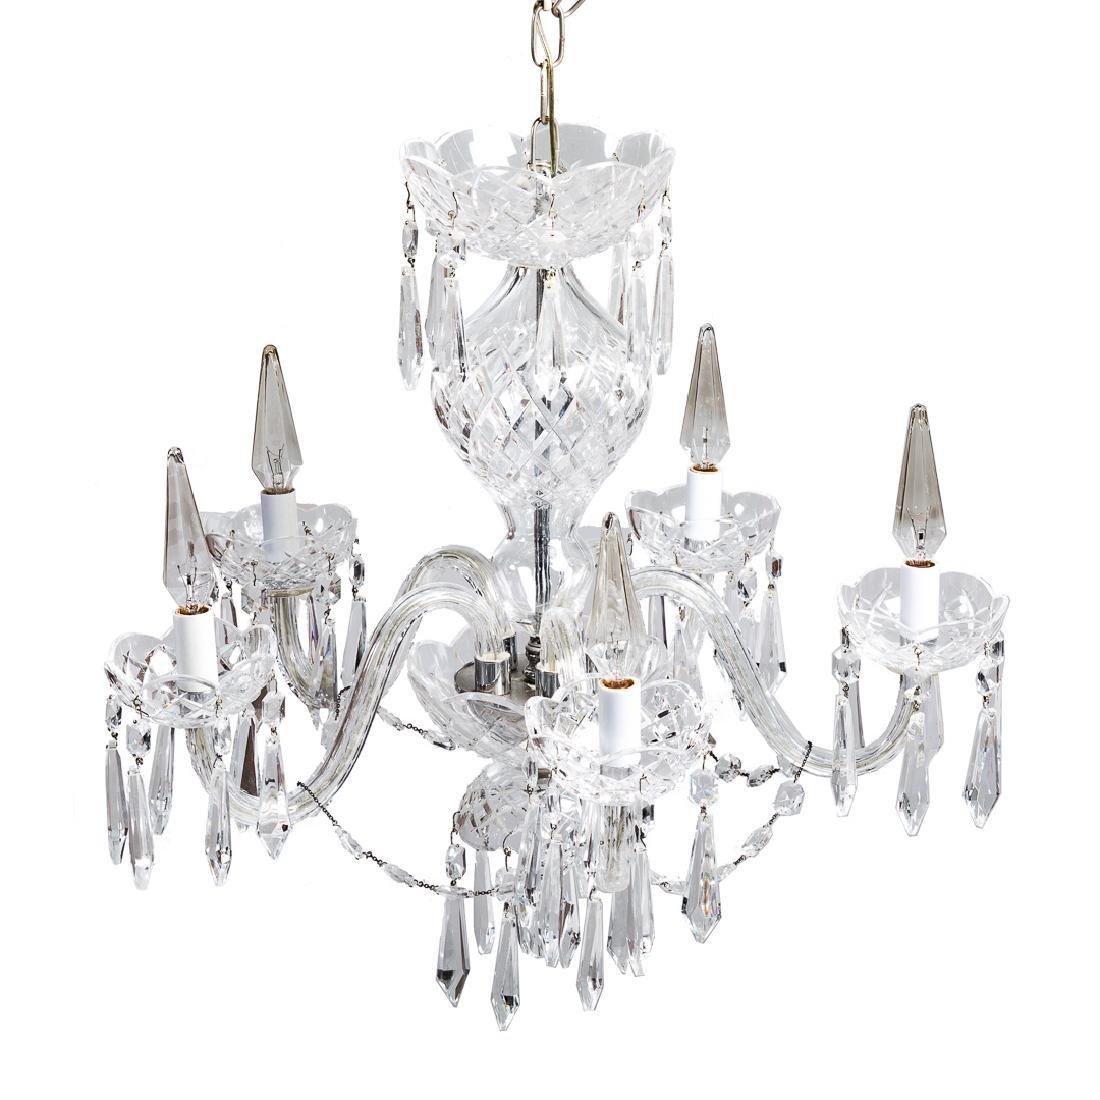 Waterford crystal Comeragh chandelier - 4